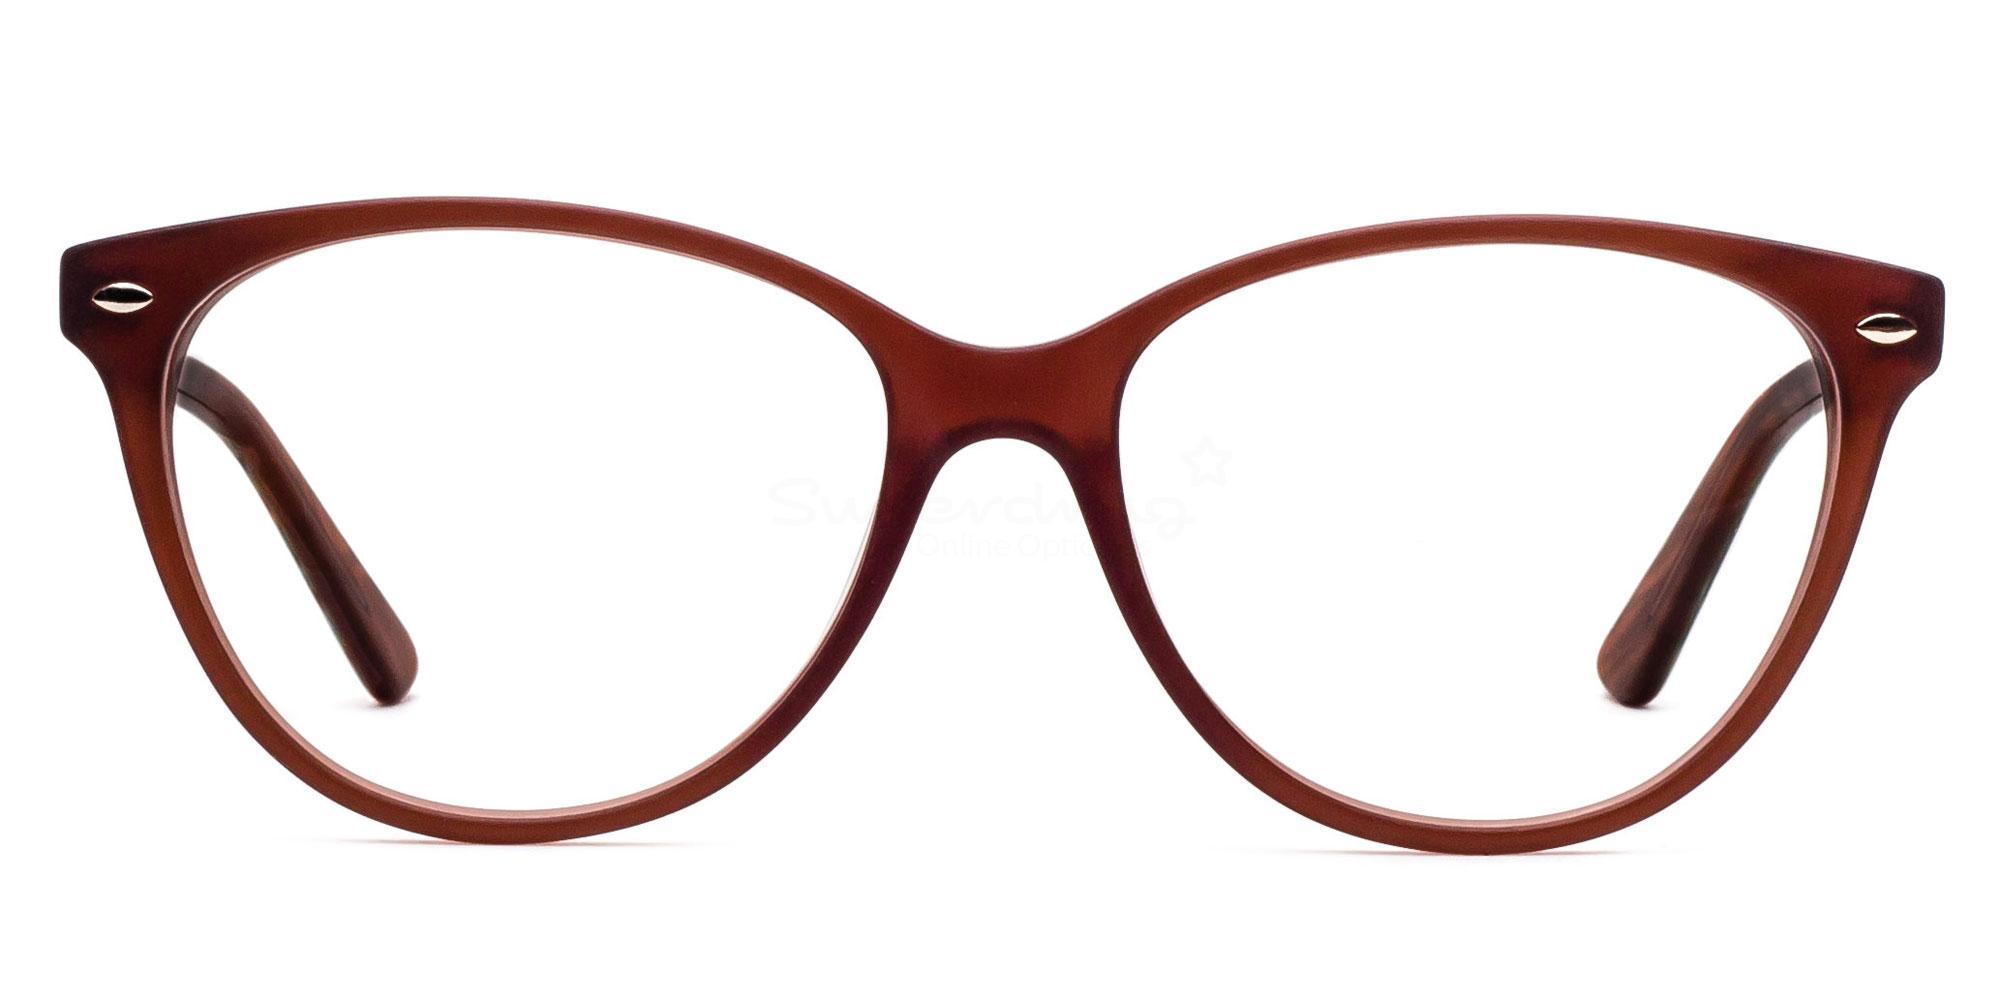 C1 SR6158 Glasses, Krypton